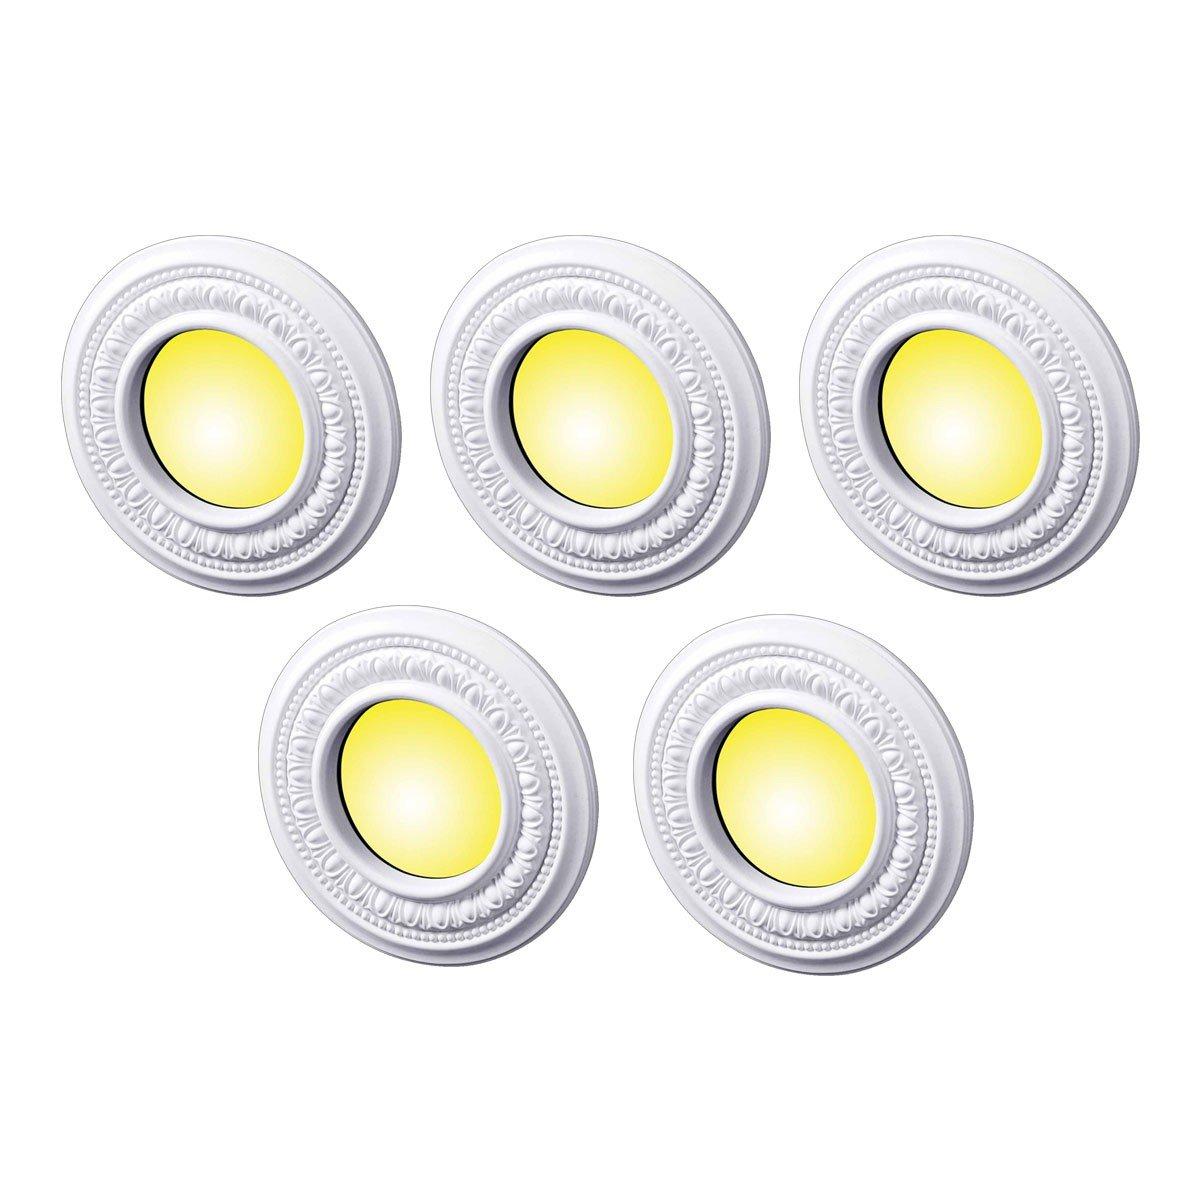 Spot Light Trim White Urethane Foam Recessed Light Trim 4 ID Set Of 5